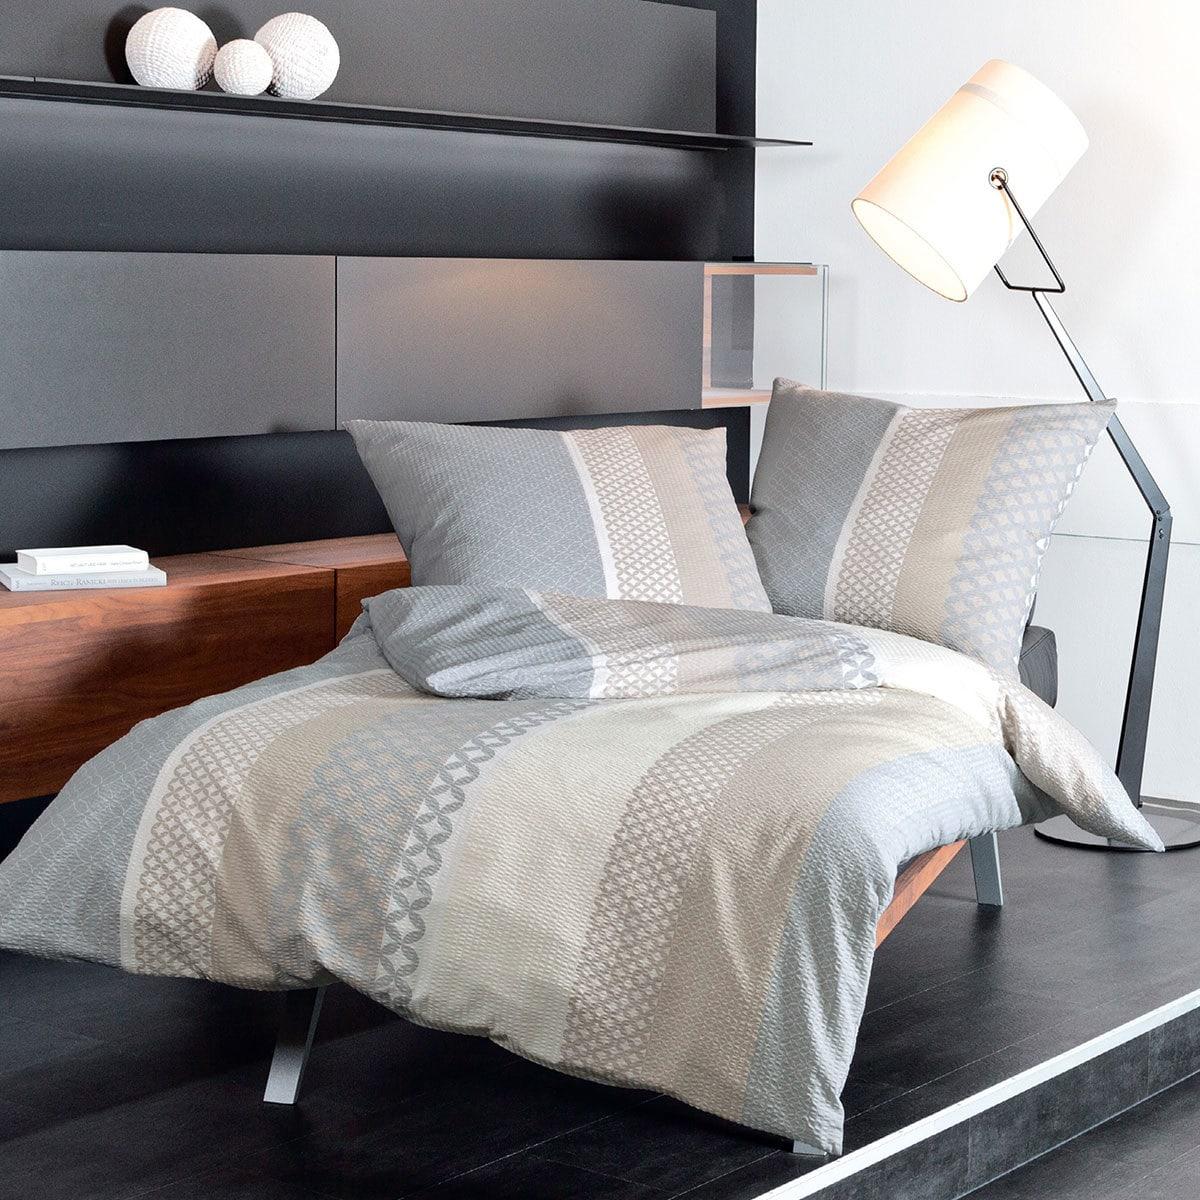 janine seersucker bettw sche tango 20043 07 sand silber g nstig online kaufen bei bettwaren shop. Black Bedroom Furniture Sets. Home Design Ideas